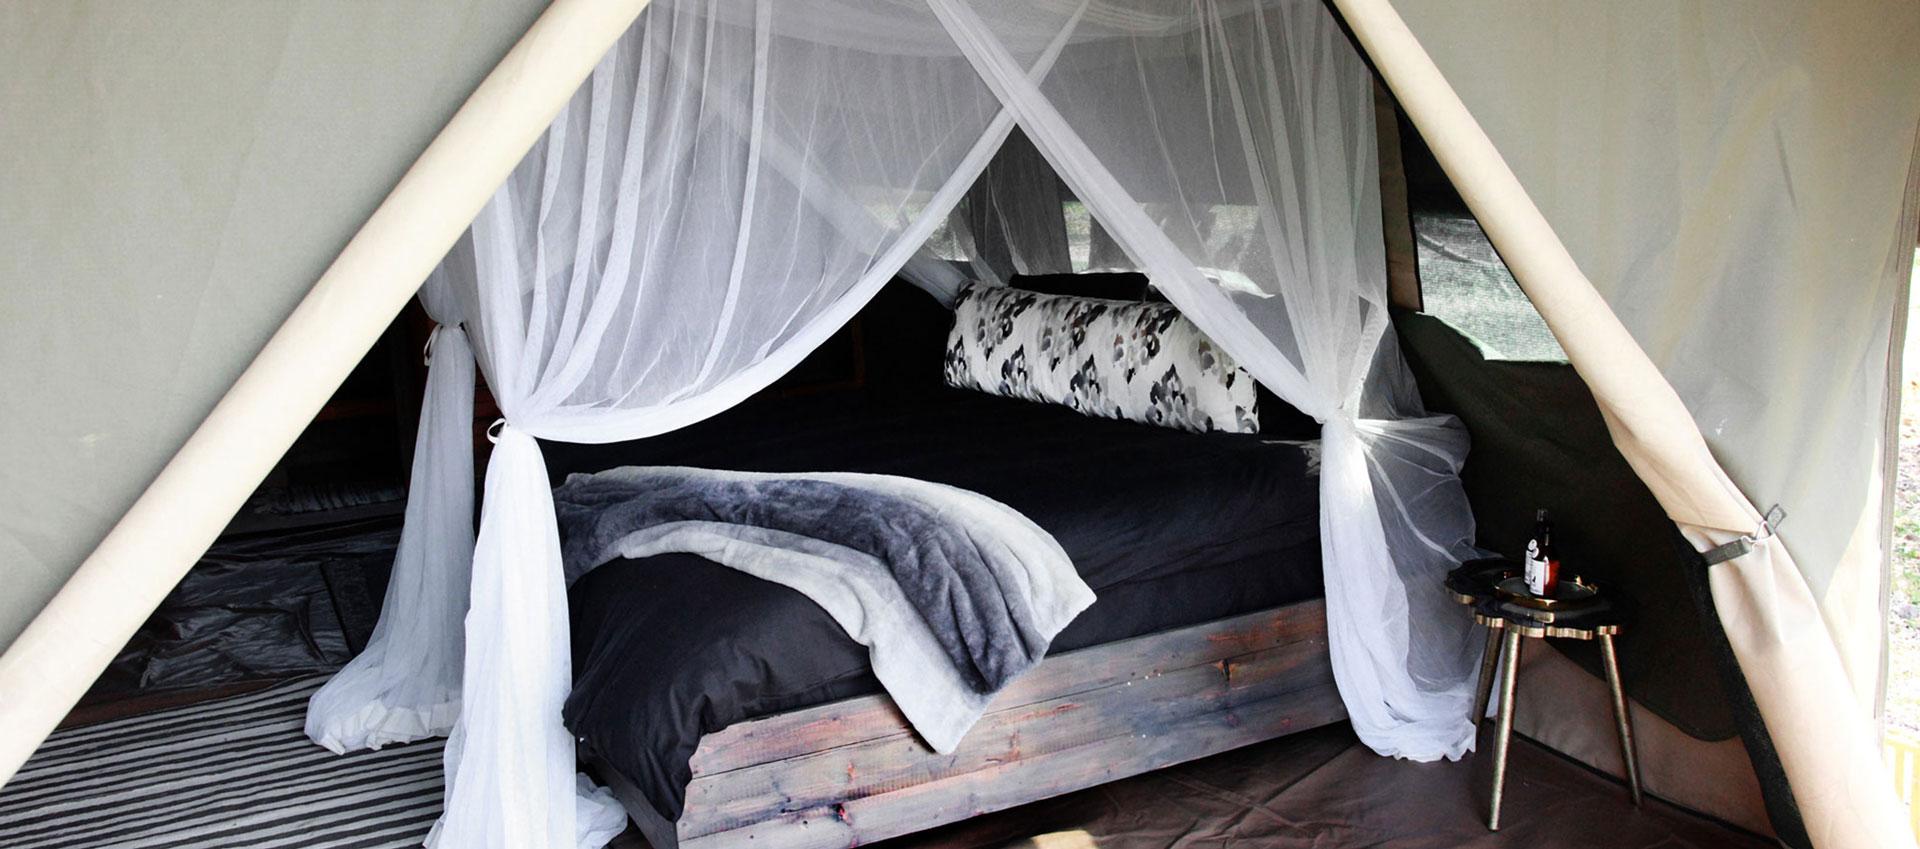 Bedtime - Shoebill Island Camp